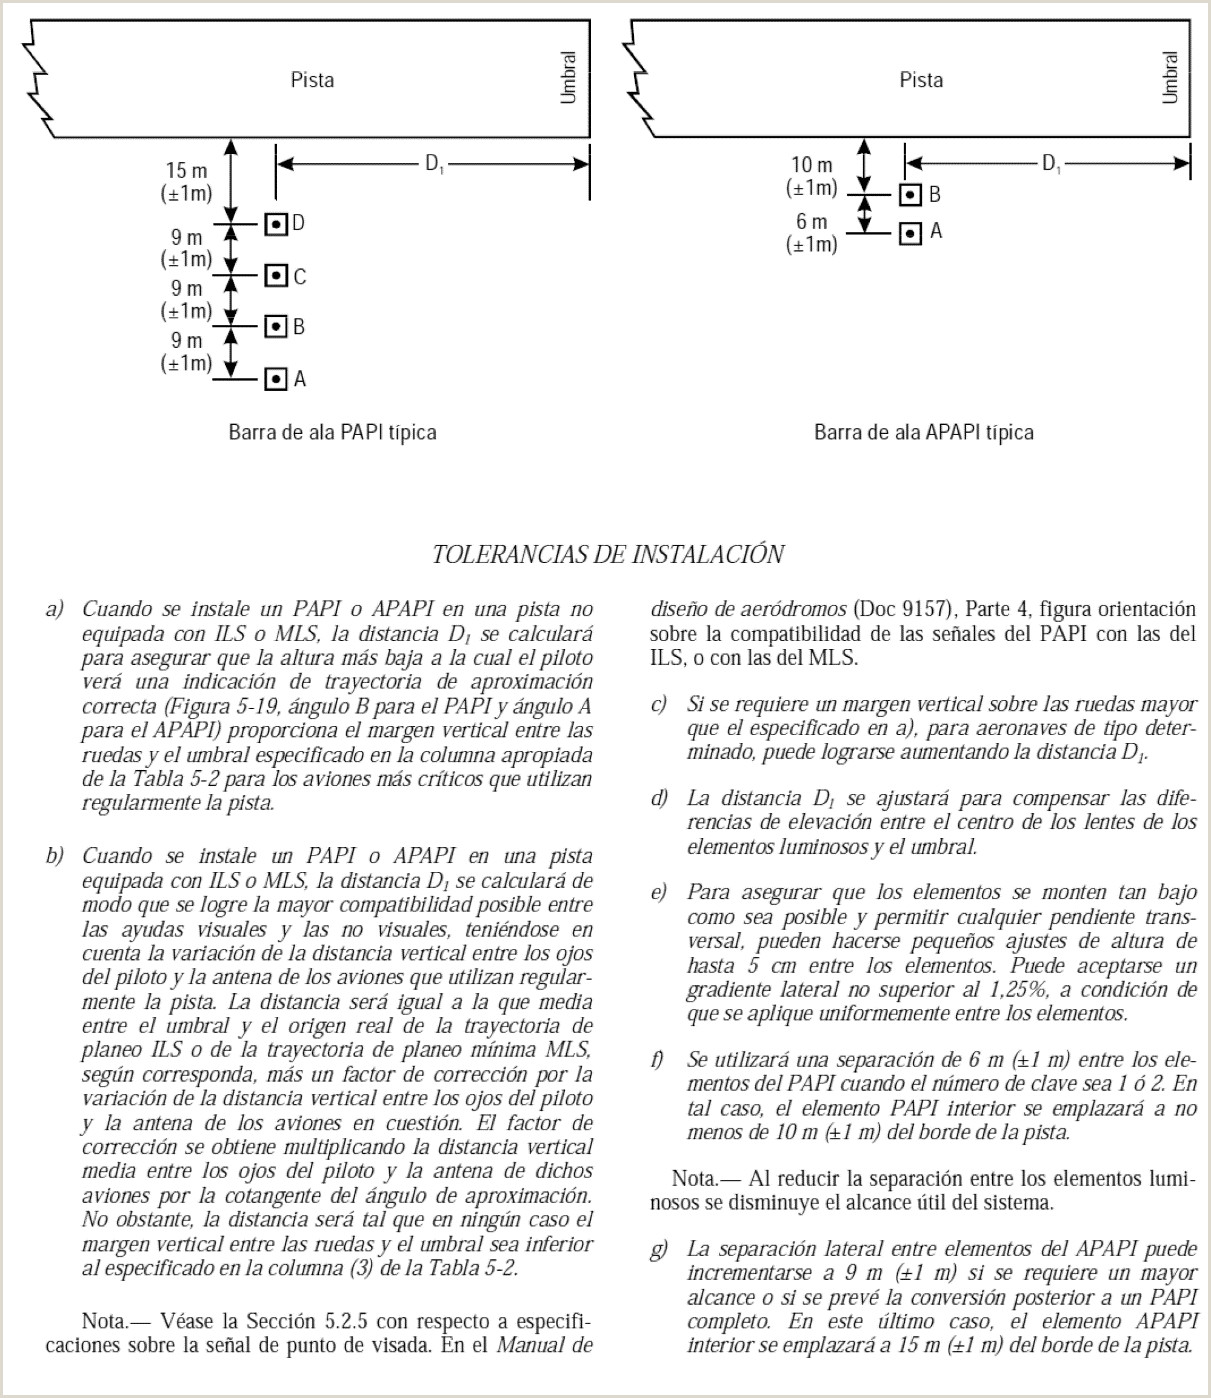 Descargar formato De Hoja De Vida Basico Boe Documento Consolidado Boe A 2009 9043